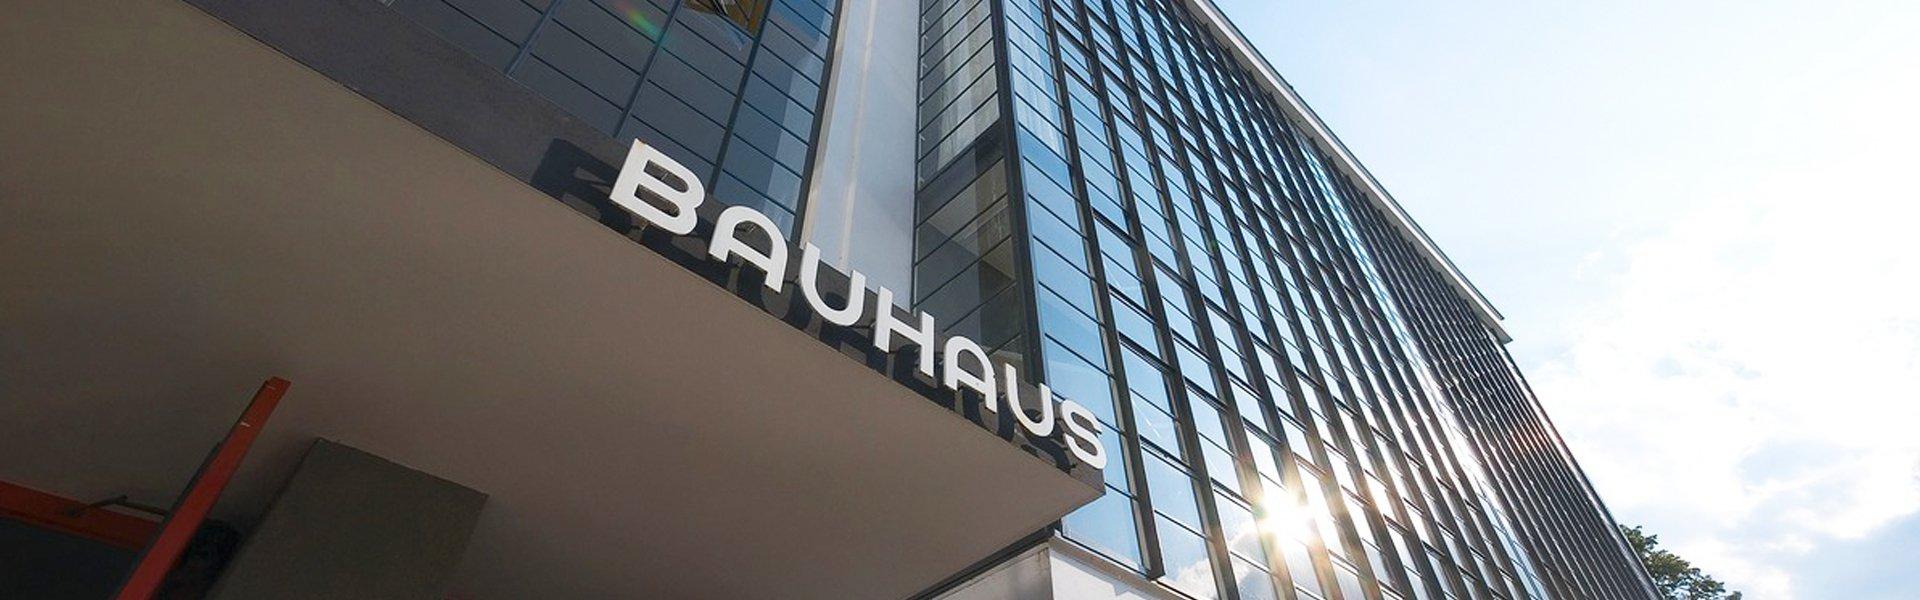 Entree van de Bauhausschool in Dessau, Duitsland